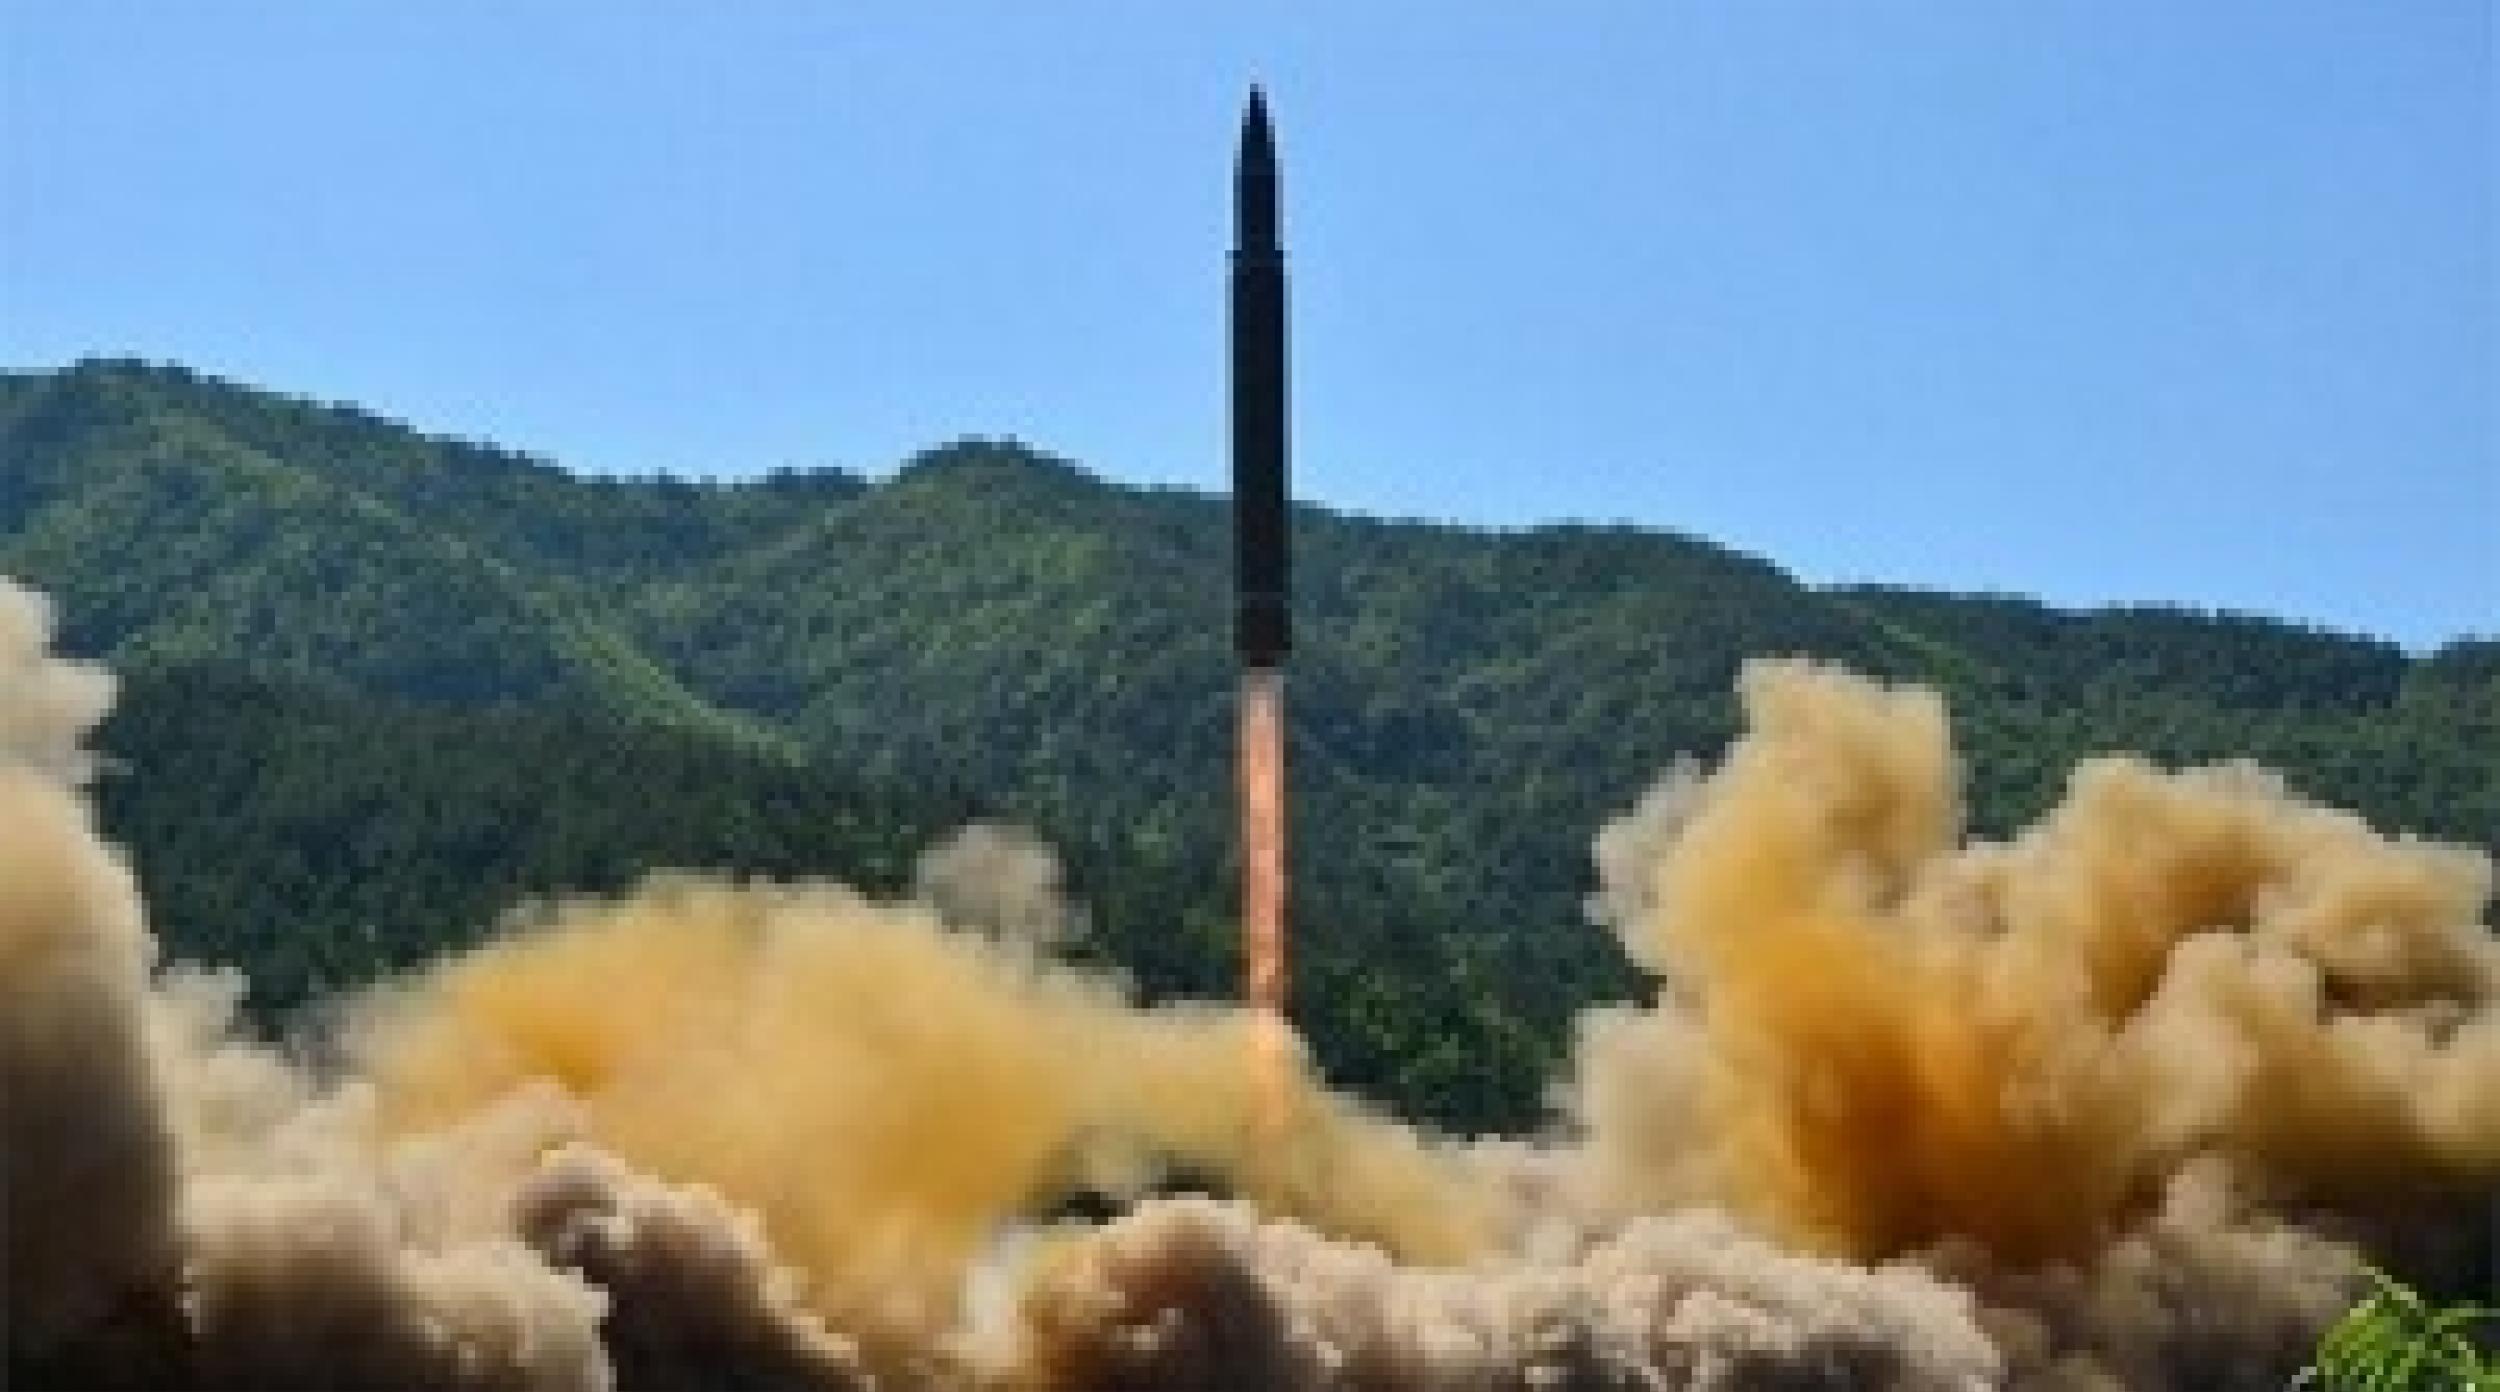 NEWS: አሜሪካ የዓለም አቀፉ ማህበረሰብ ከሰሜን ኮሪያ ጋር ያለውን ግንኙነት እንዲያቋርጥ ጠየቀች - North Korea: US Urges all Nations to Cut Ties